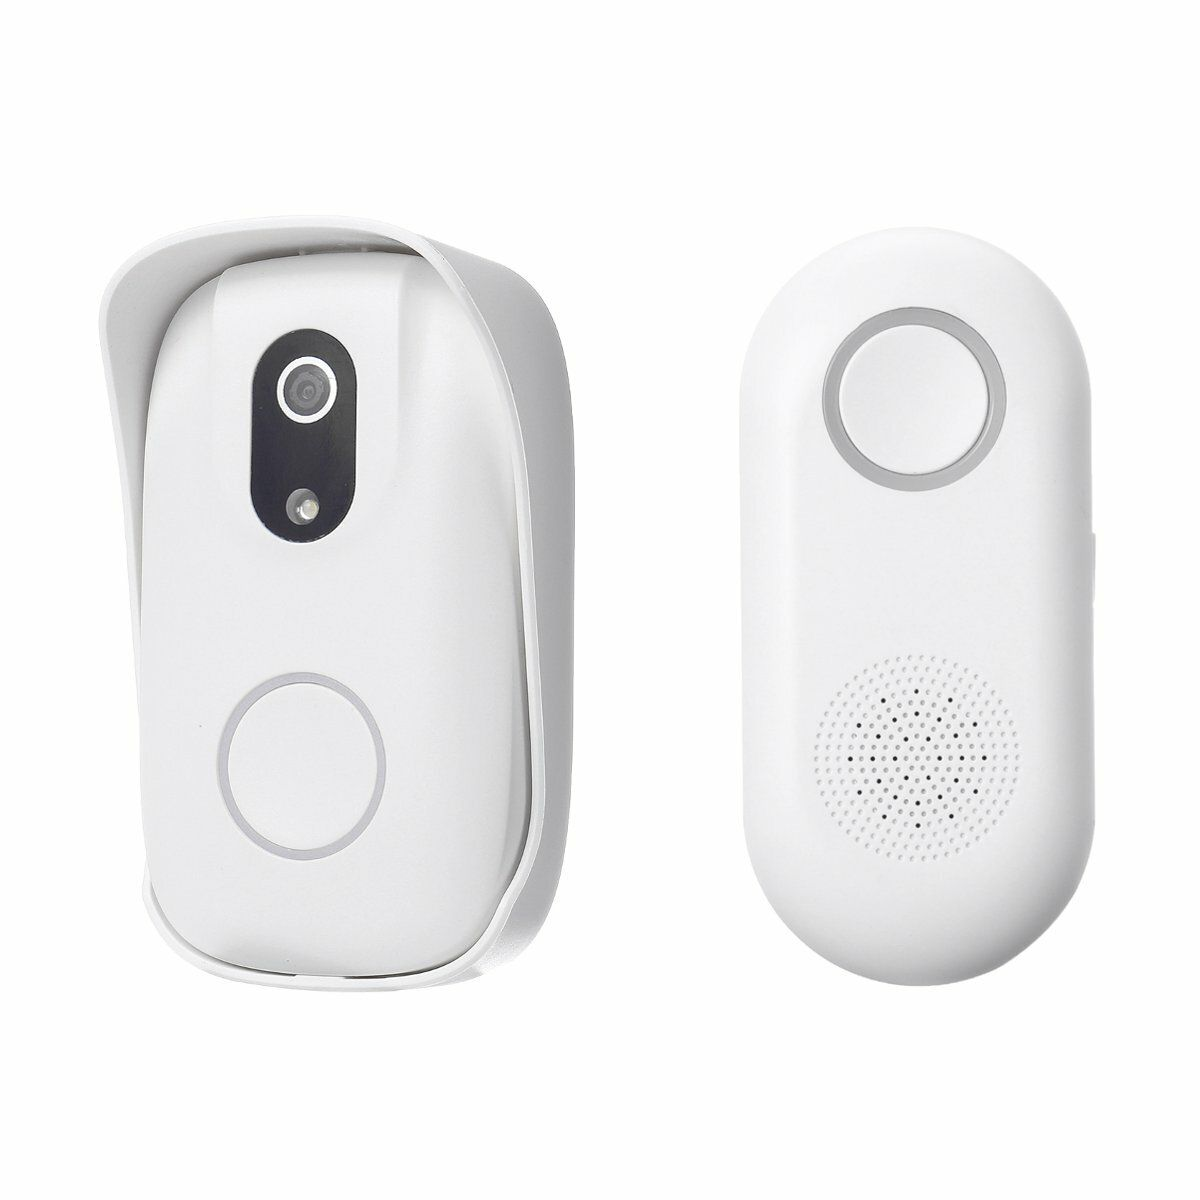 Smart Wireless Doorbell Lens Video HD Security Camera Night Vision App Control